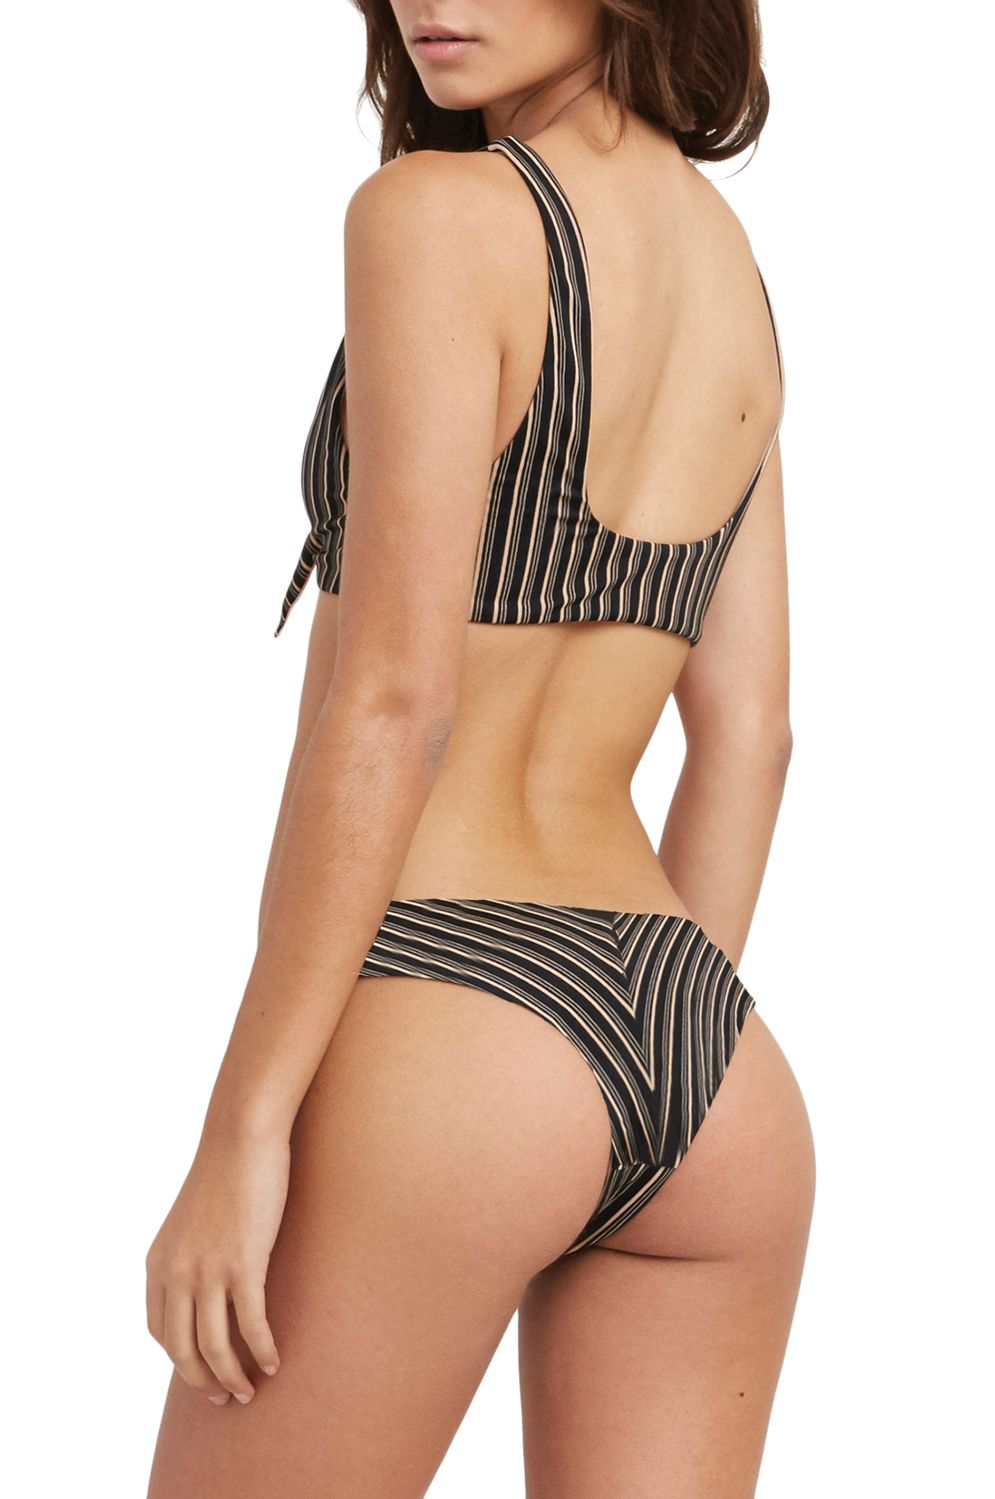 Bikini Tanga RVCA AMALFI CHEEKY Black